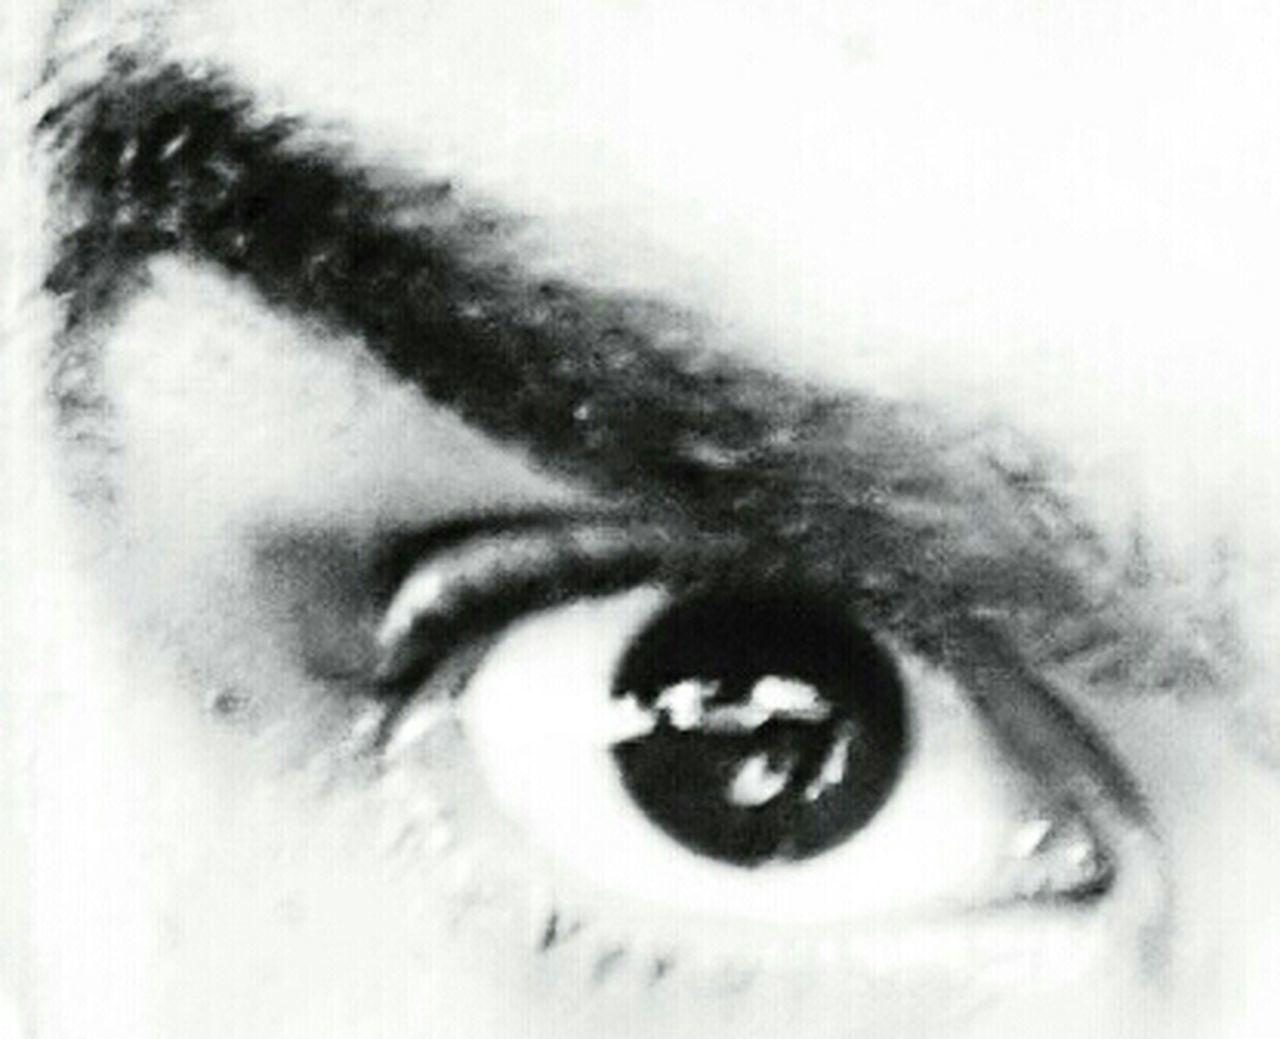 human eye, close-up, eyesight, looking at camera, eyelash, human face, young adult, eyeball, iris - eye, human skin, full frame, eyebrow, focus on foreground